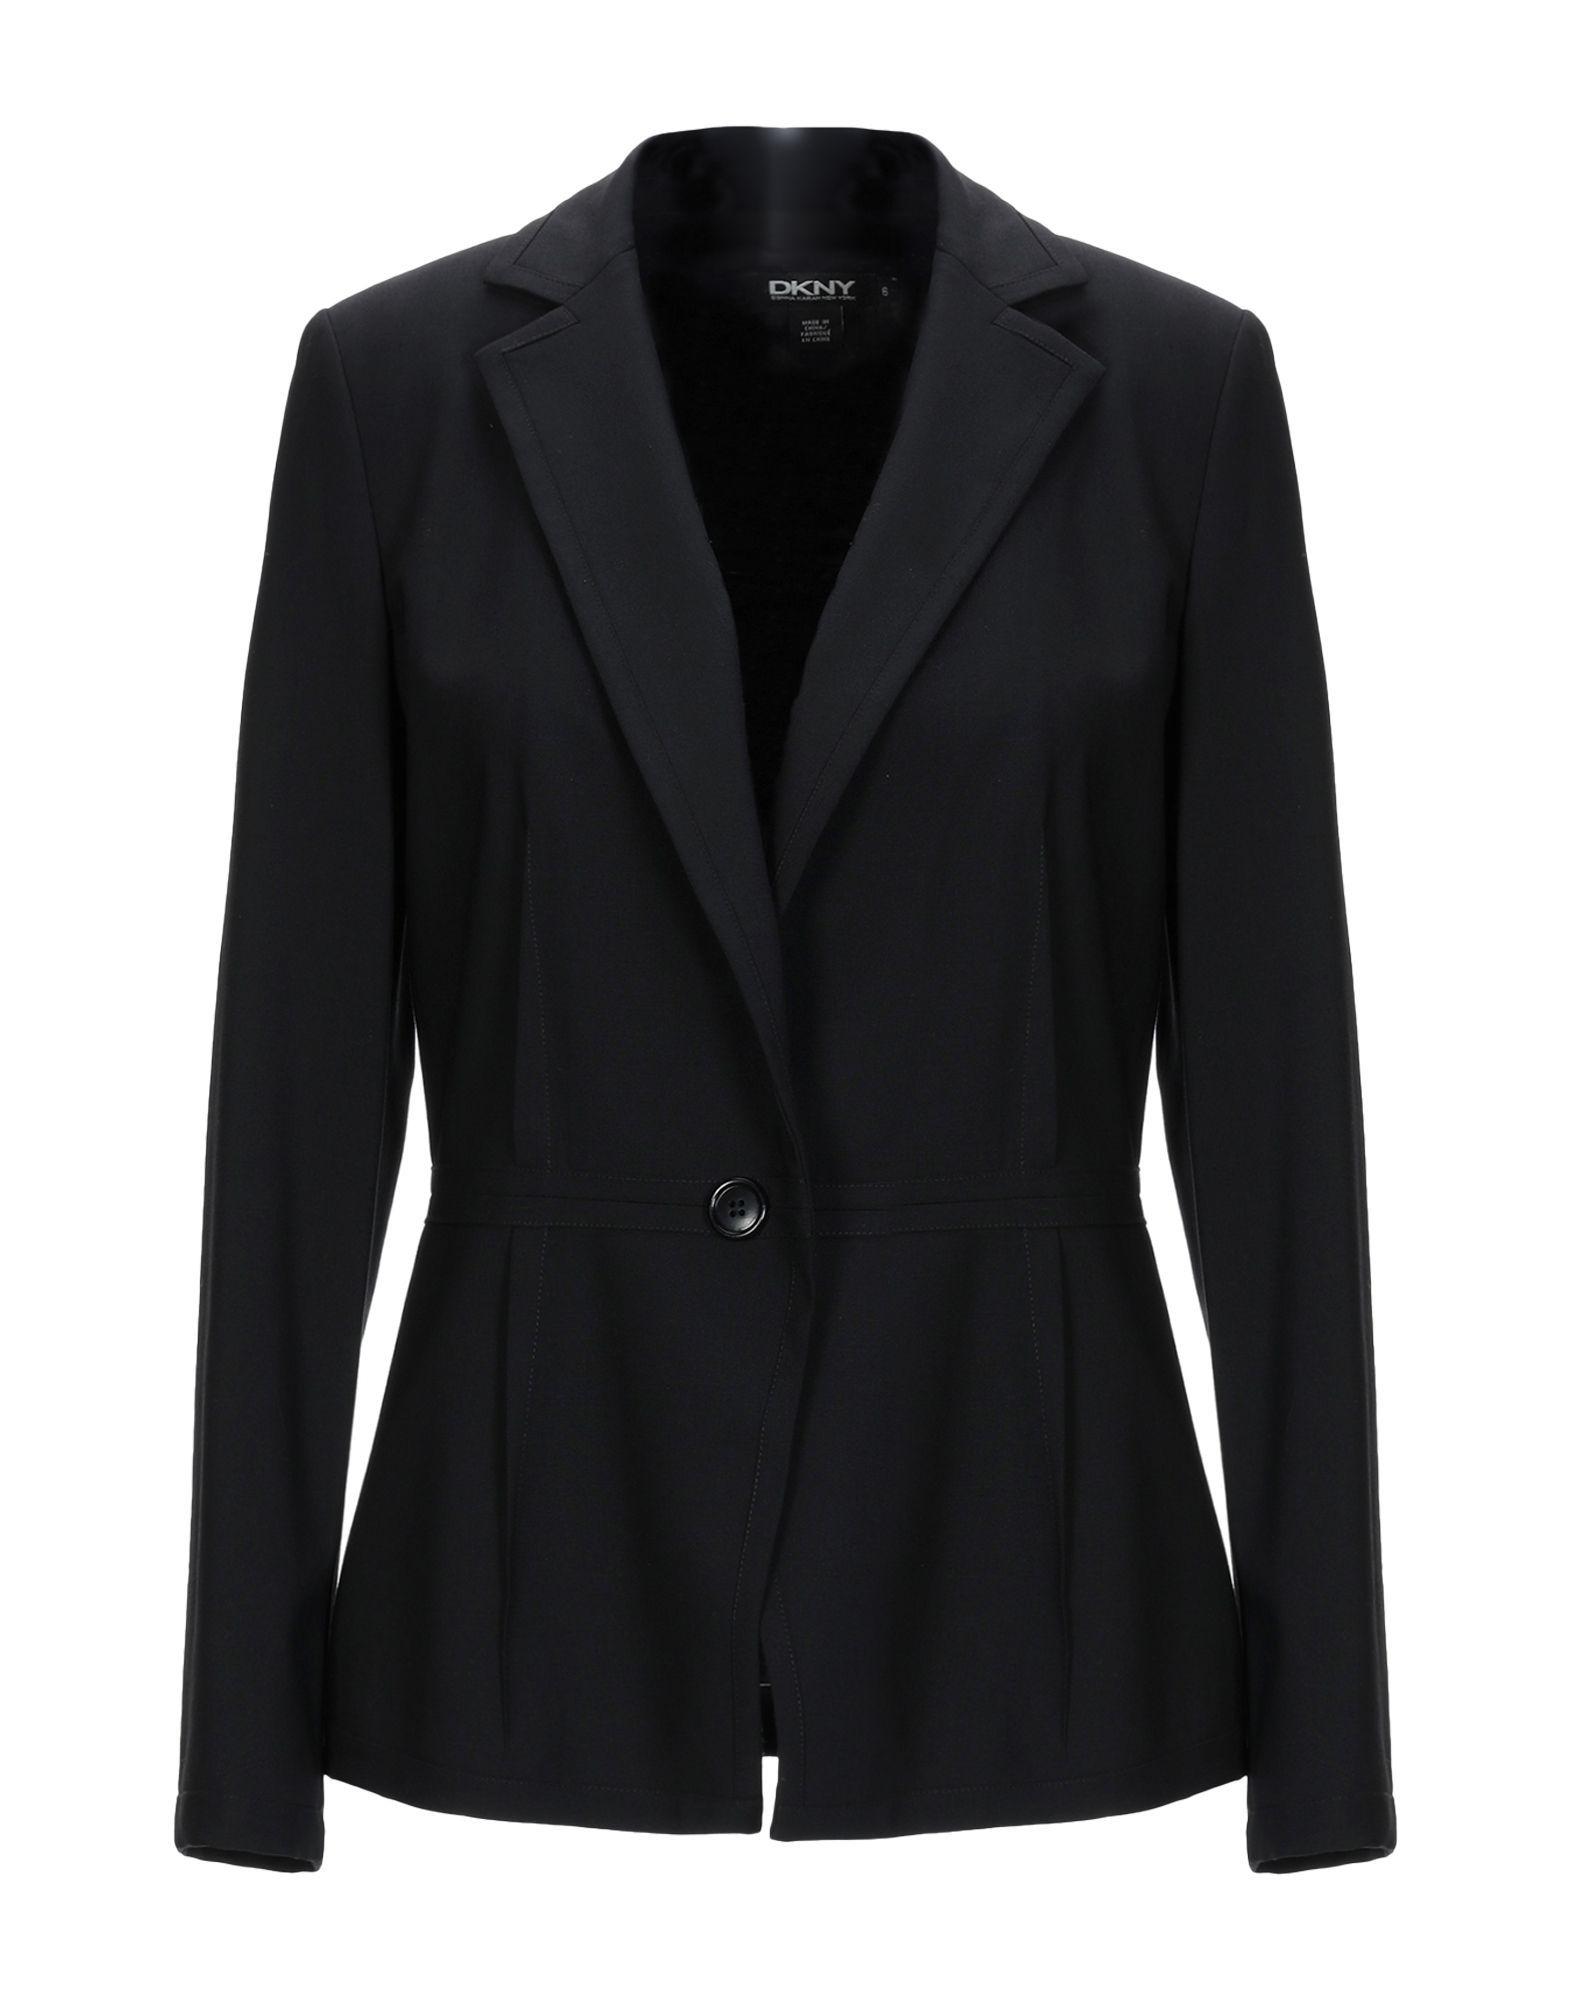 DKNY Black Wool Single Breasted Jacket